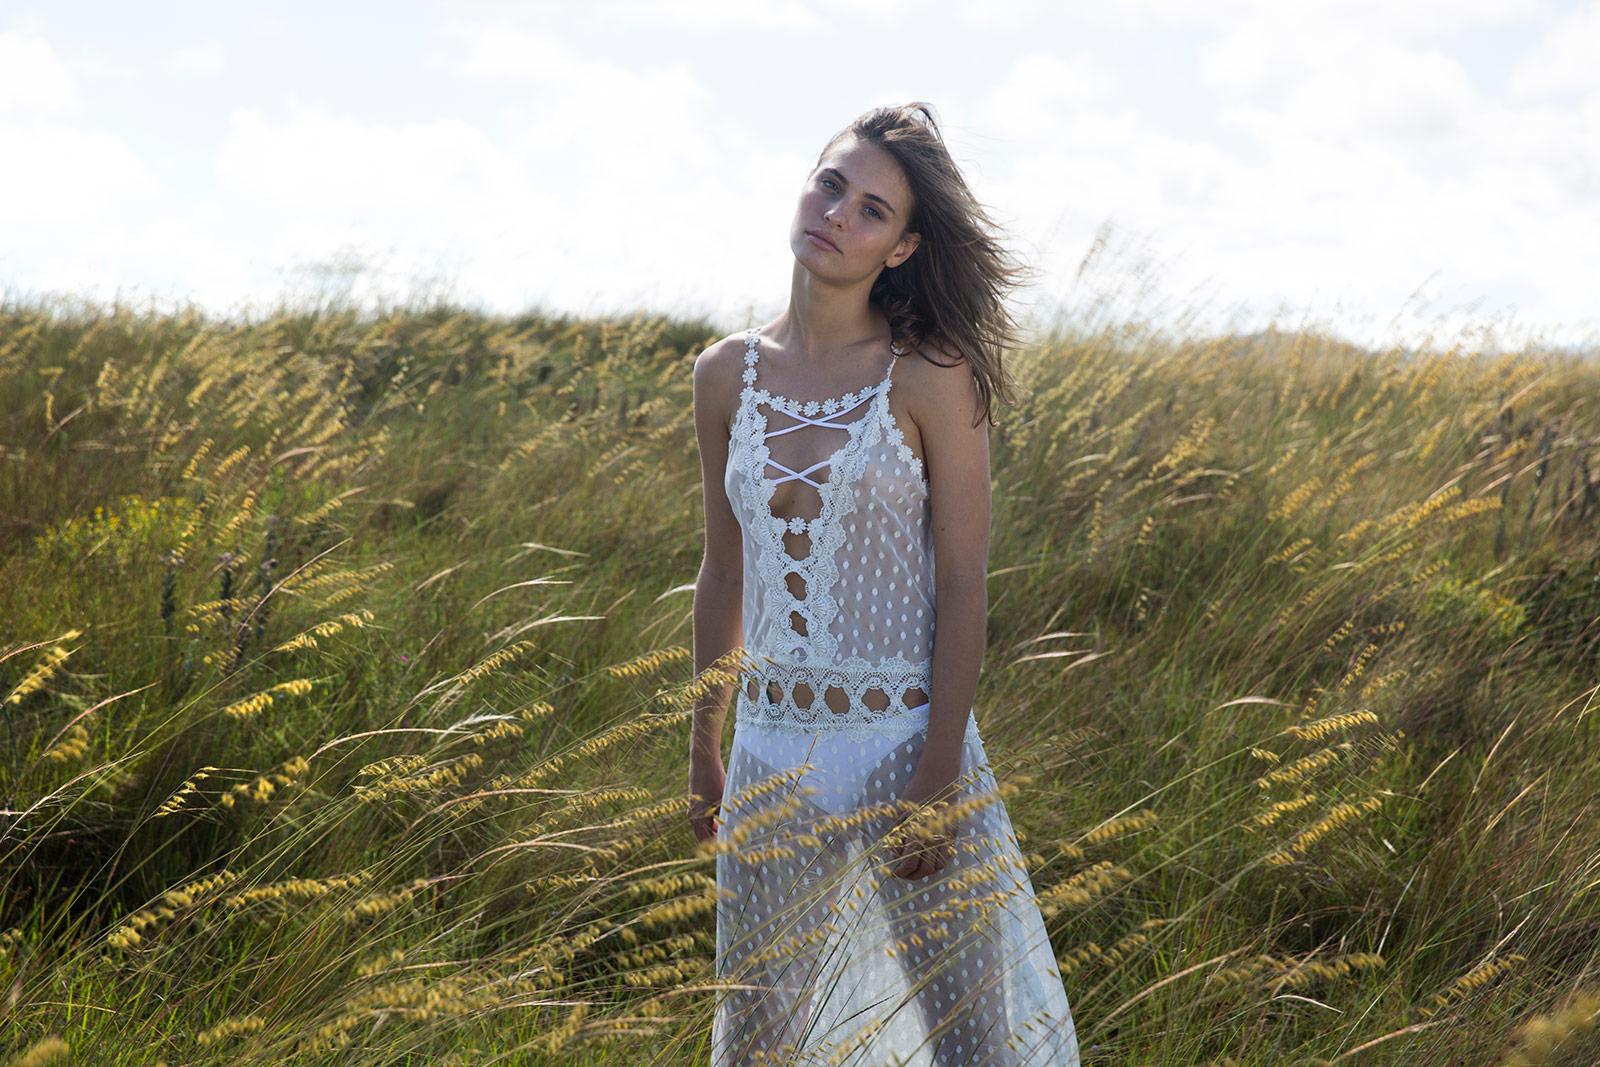 1ec6b6c51a2a Λευκό διάφανο μακρύ φόρεμα για την παραλία - NIC OFF WHITE · Λευκό διάφανο  μακρύ ...